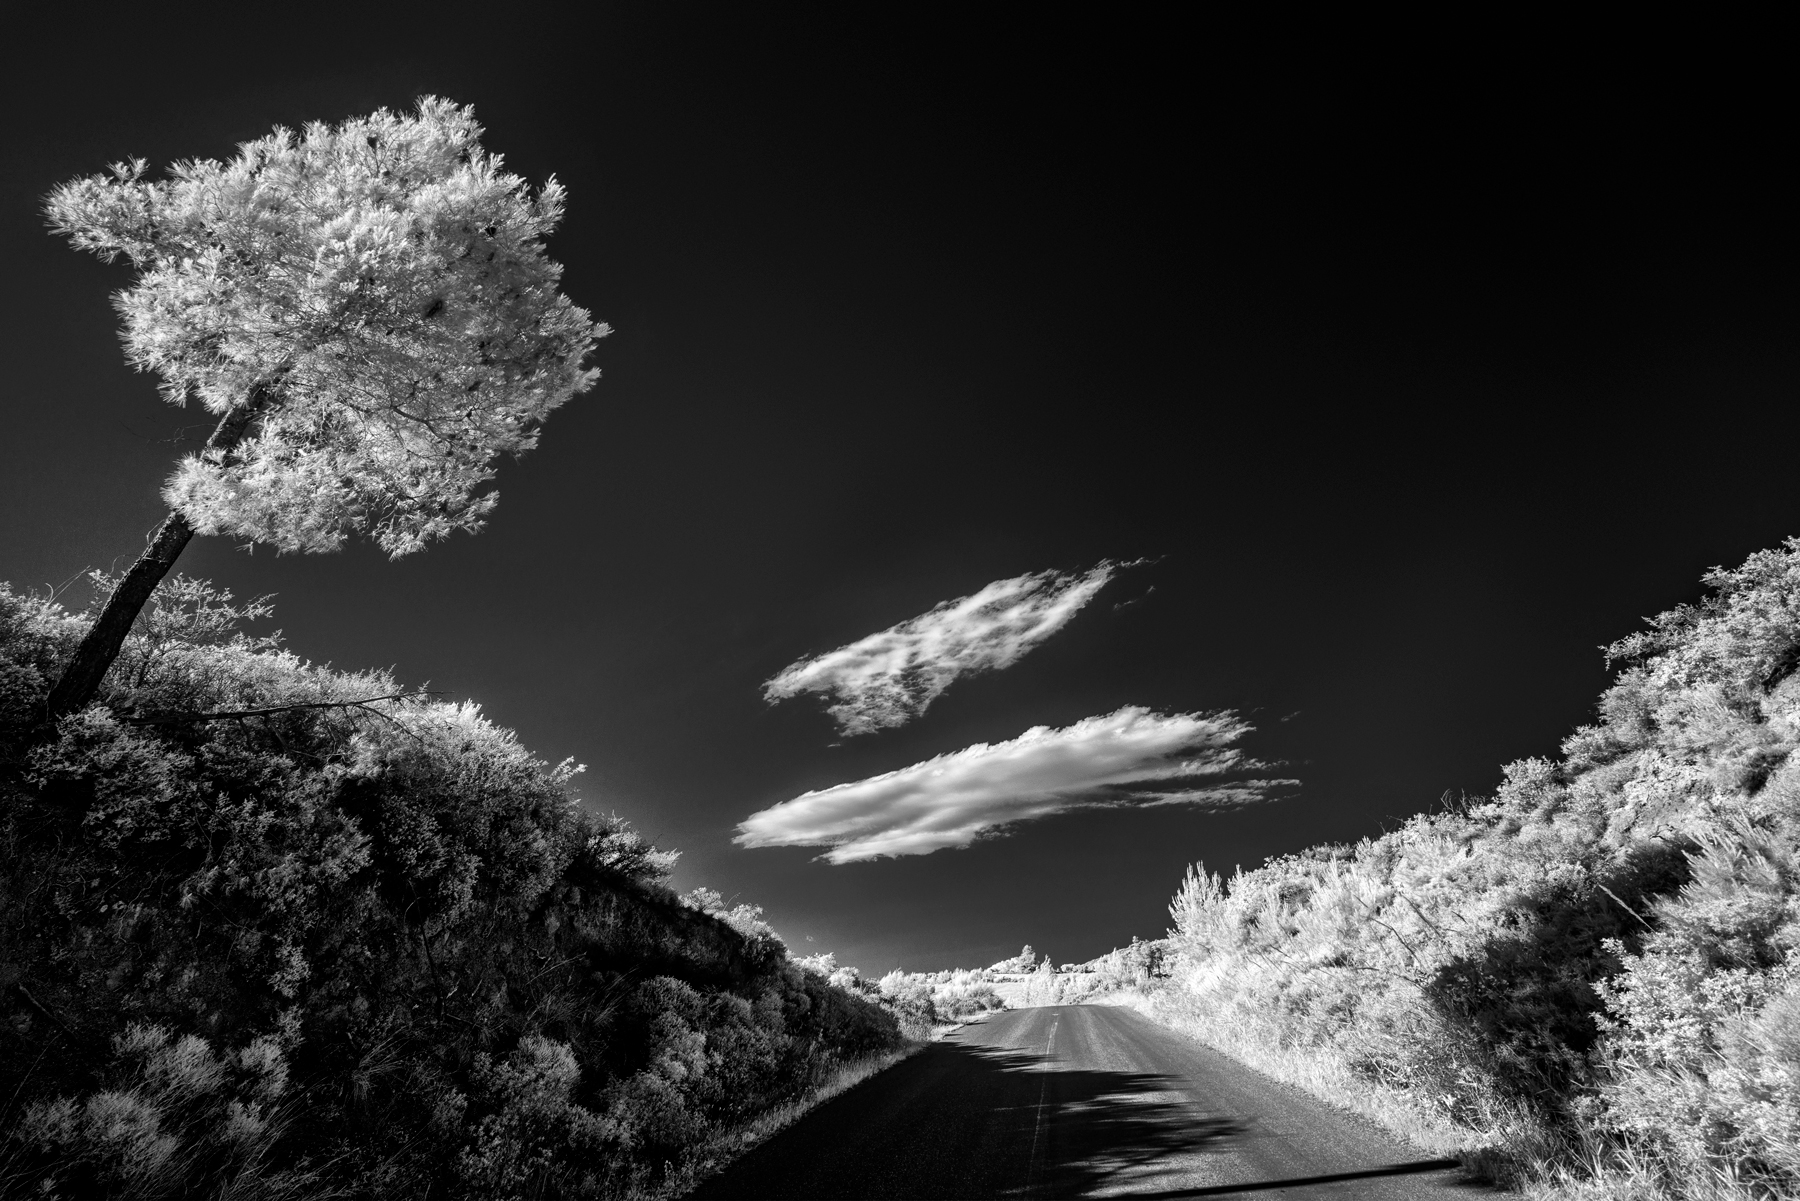 Pepe_Pax_The Road to Chaniotis.jpg